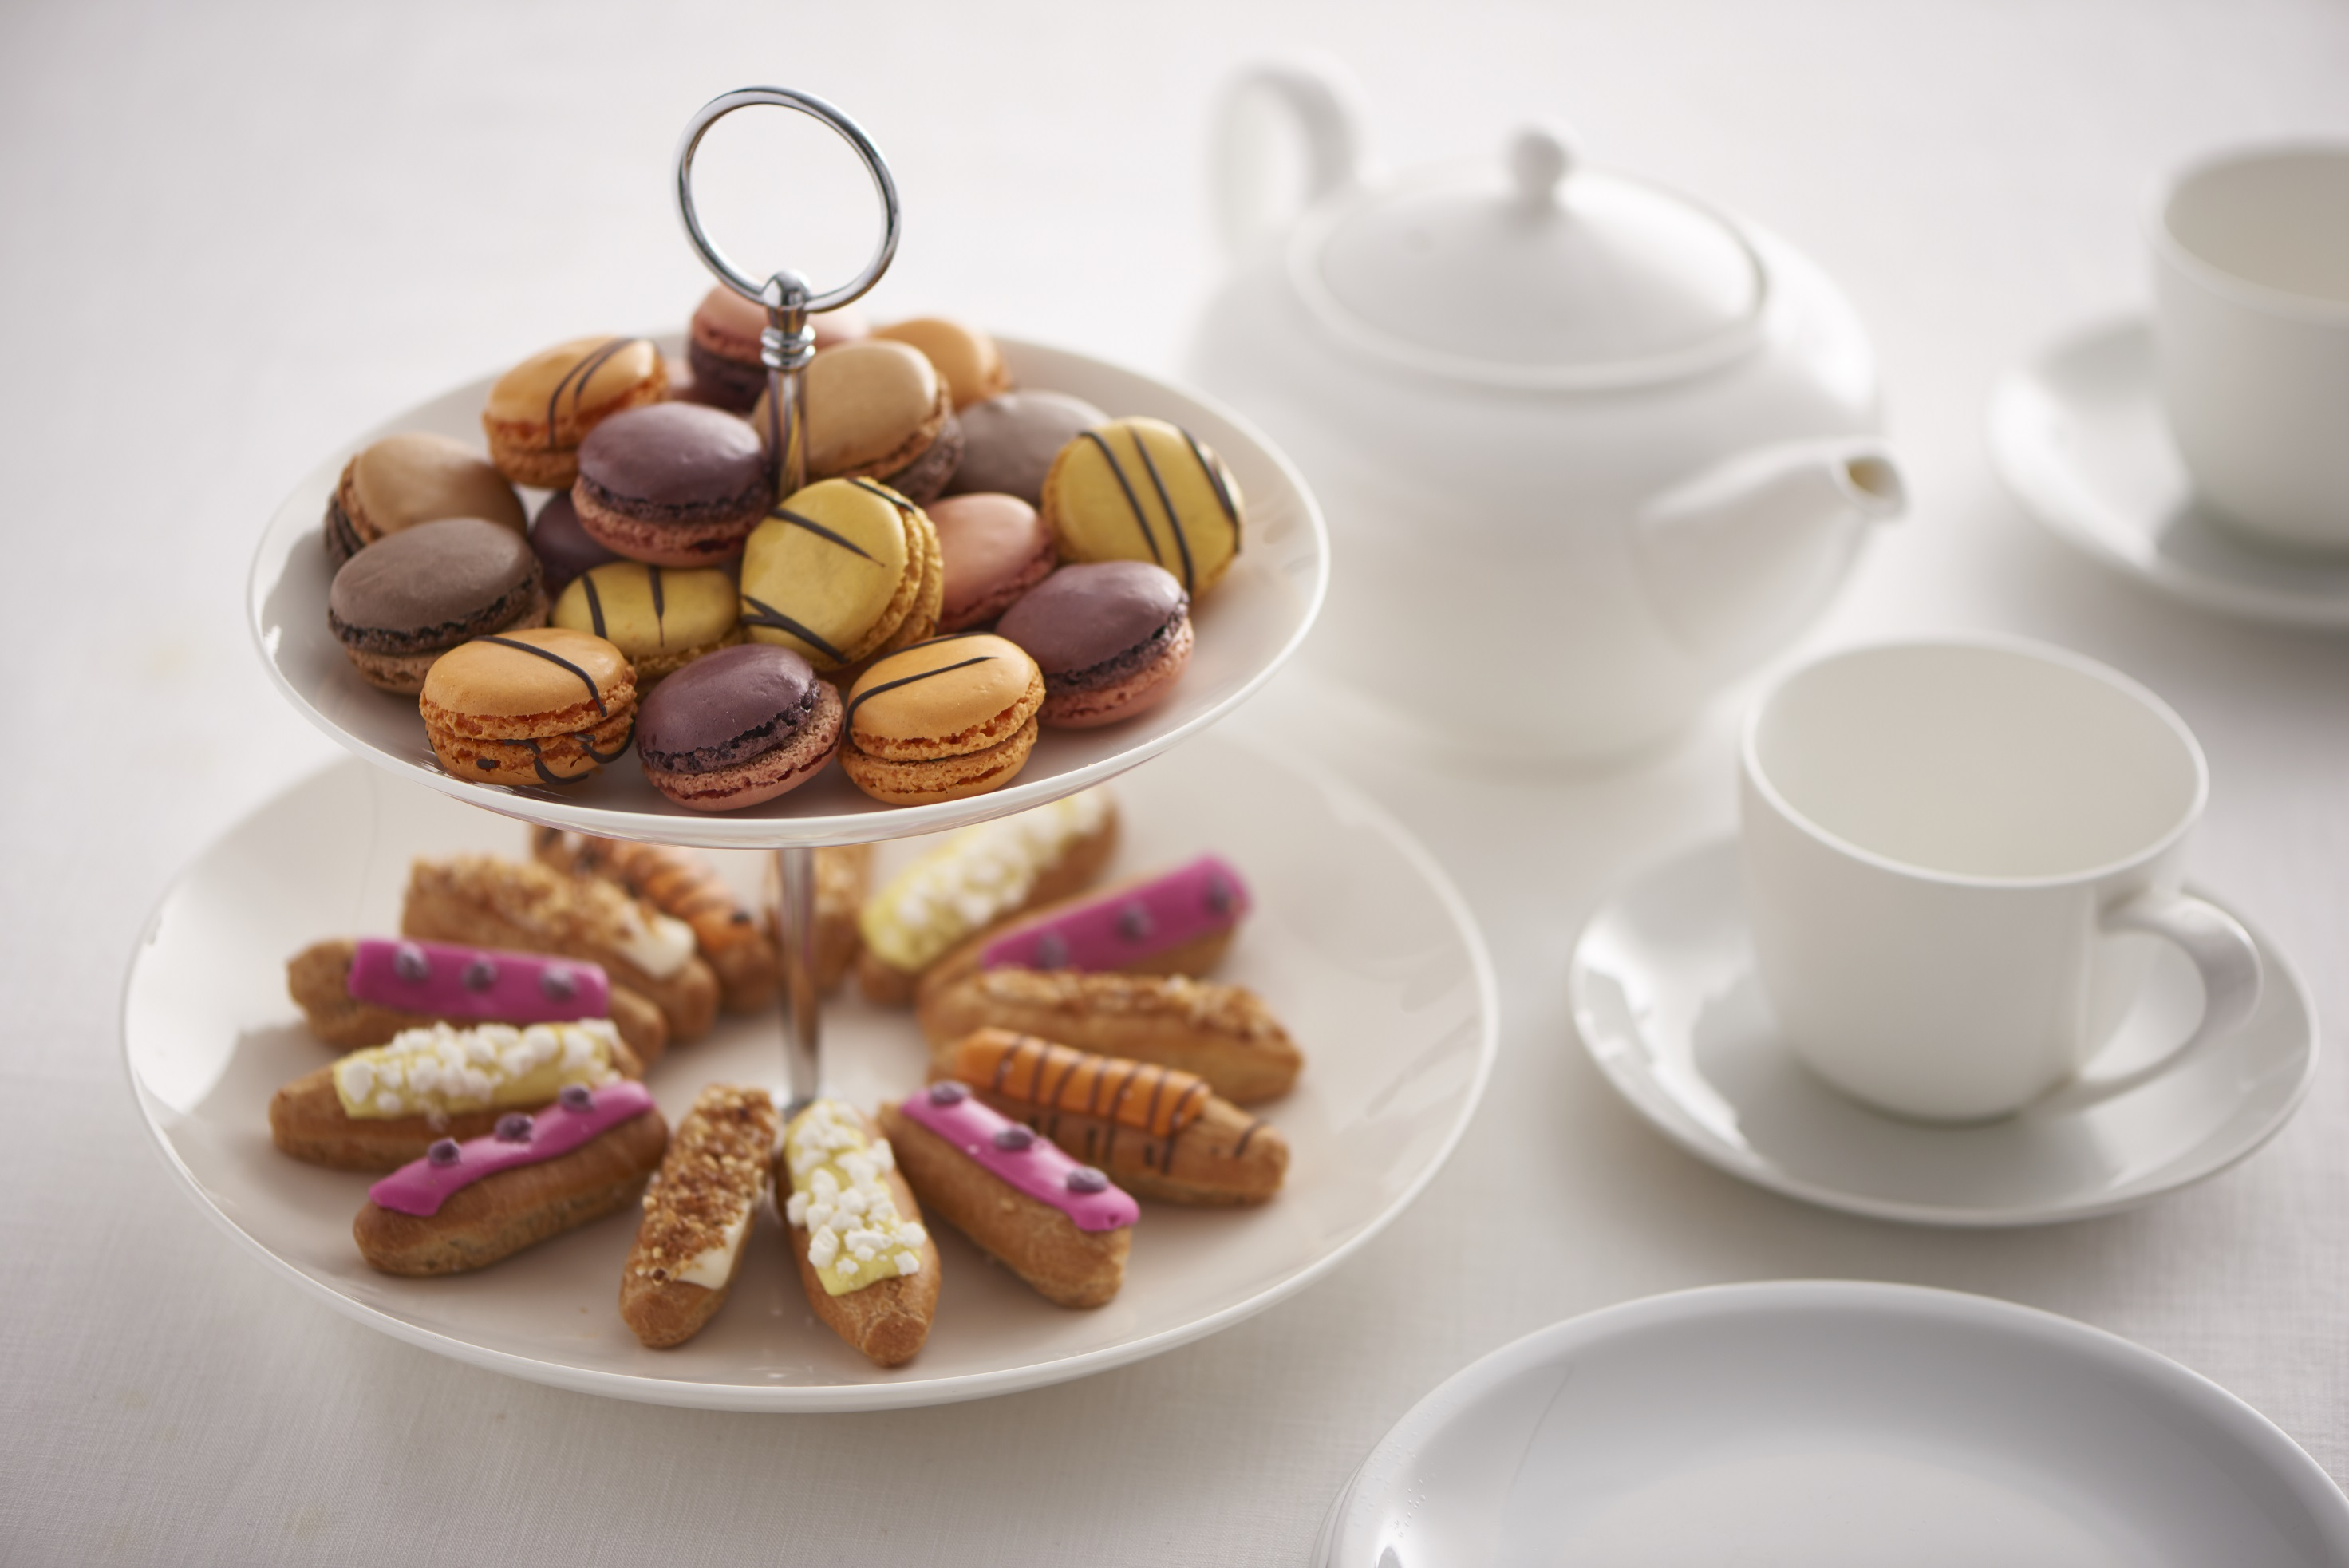 Tipiak has the perfect ingredients for afternoon tea tipiak